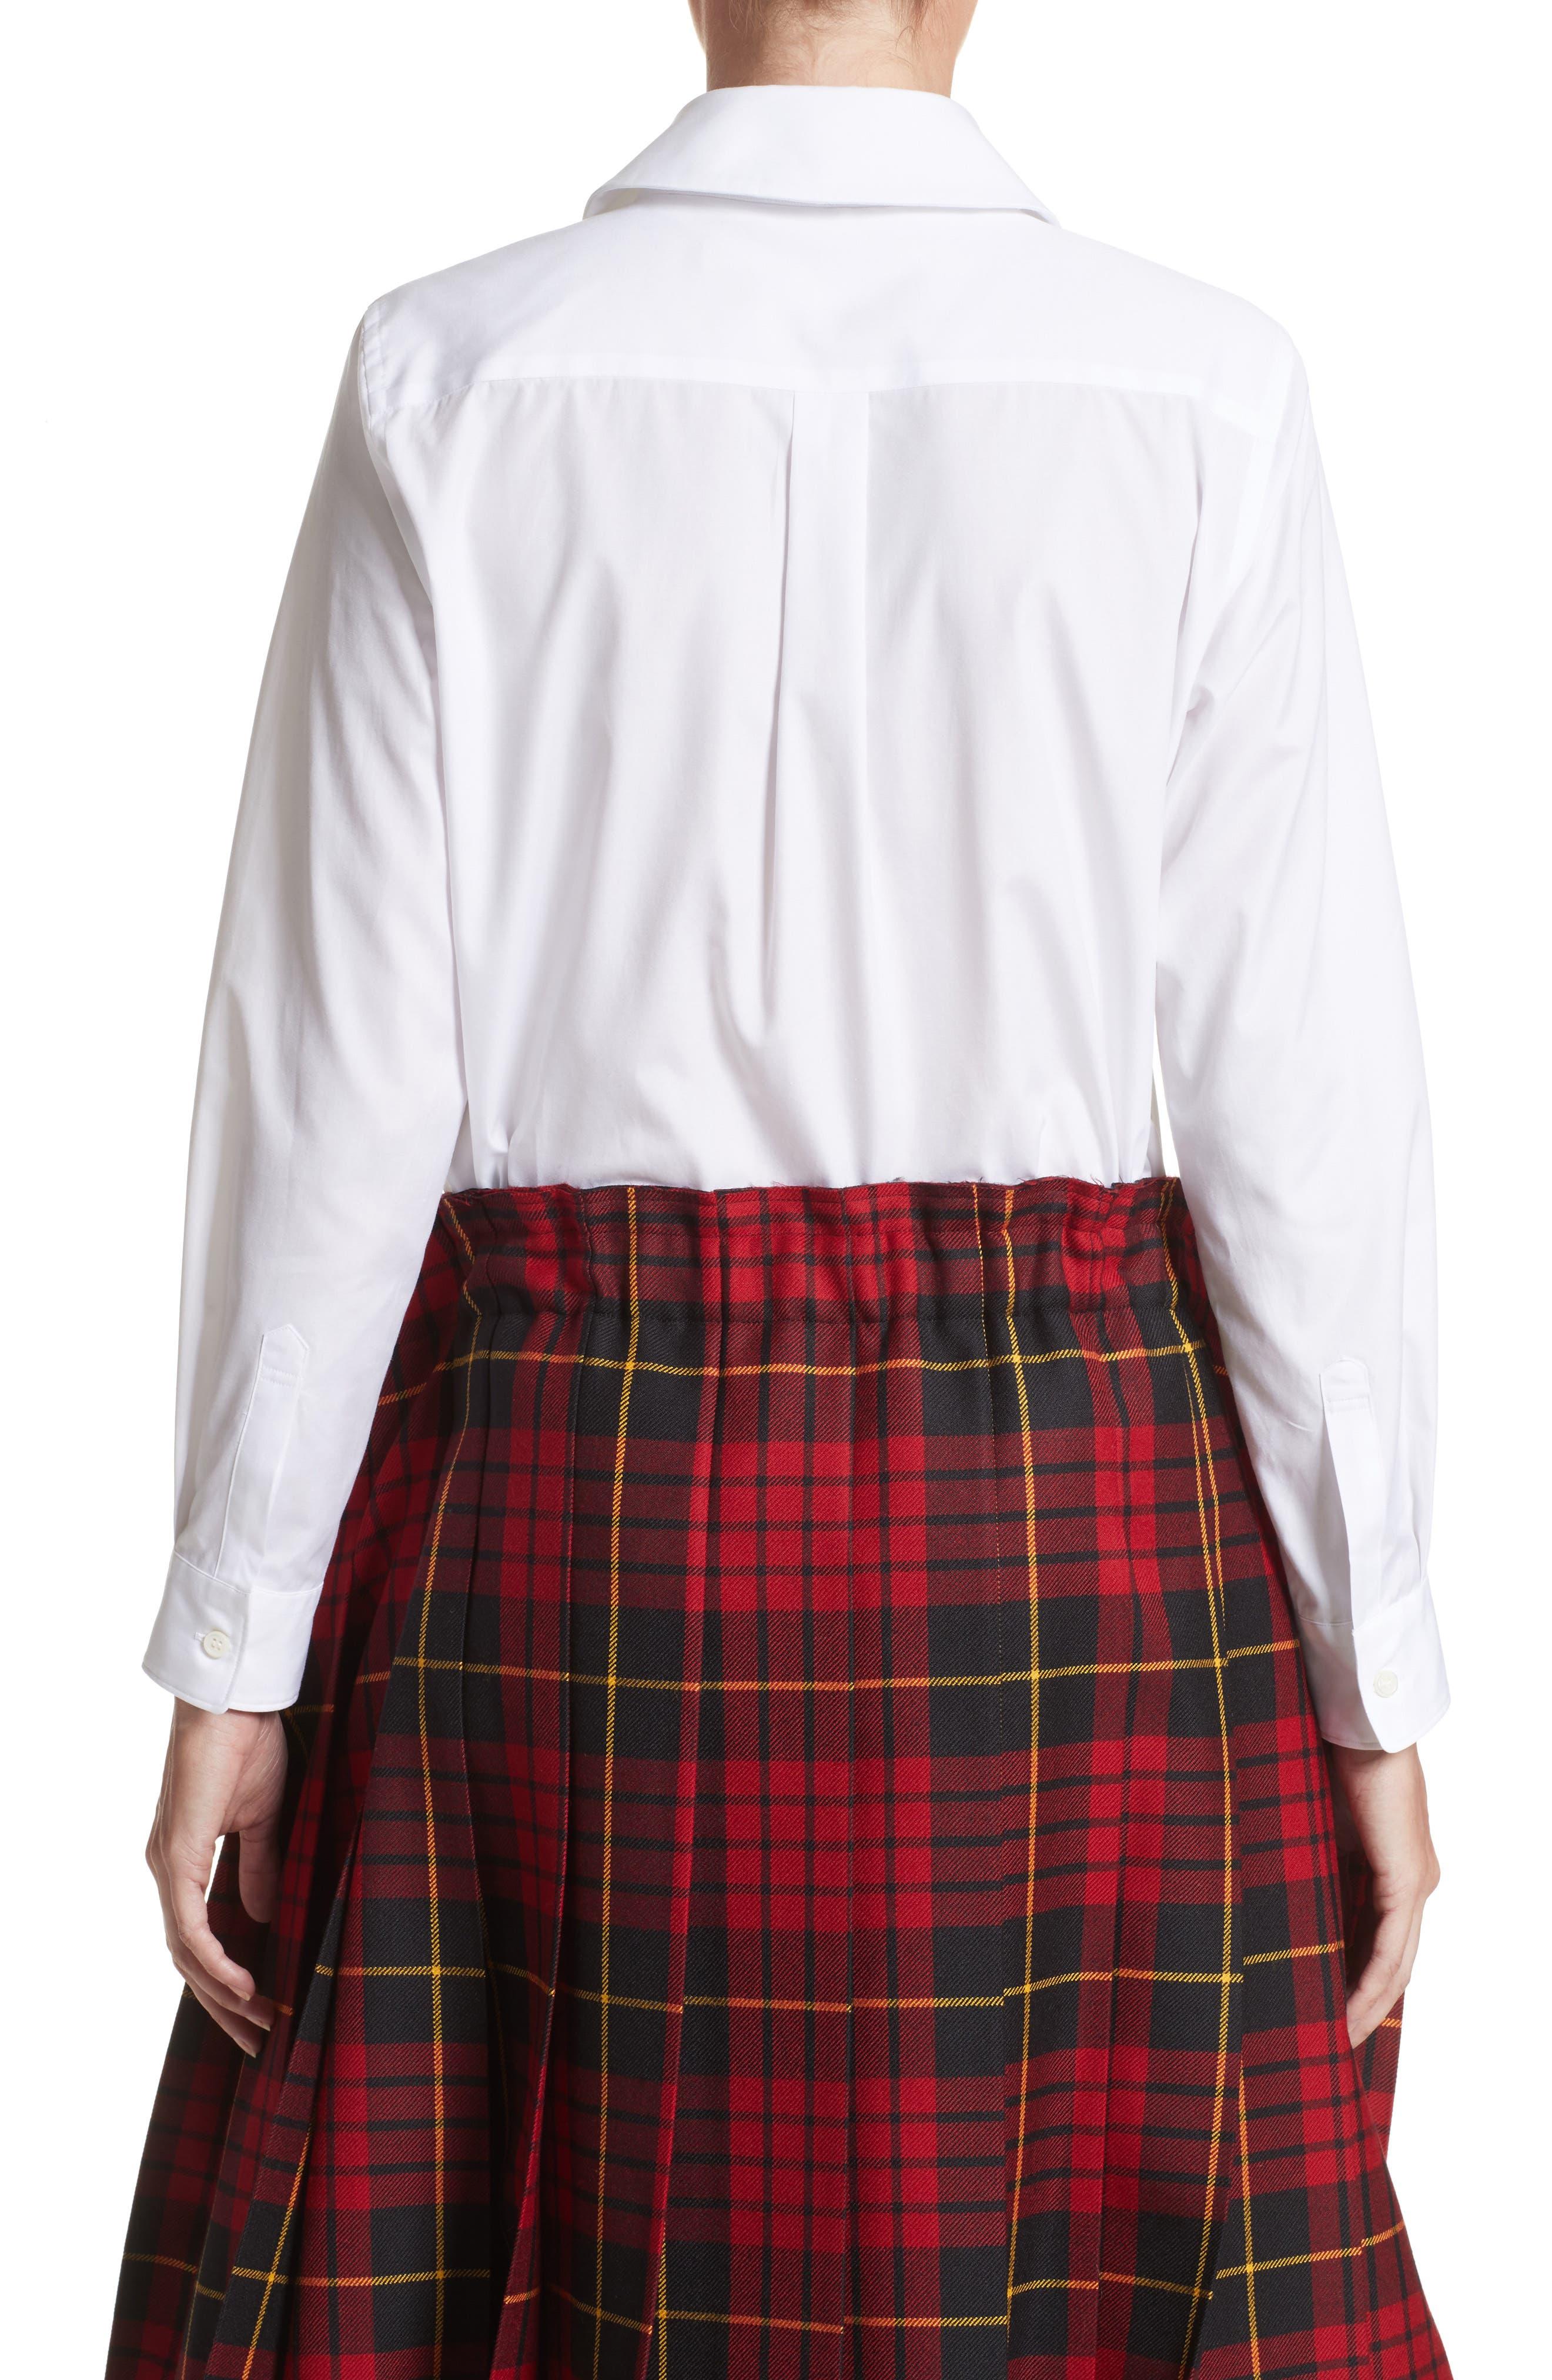 Cotton Broadcloth Blouse,                             Alternate thumbnail 2, color,                             White